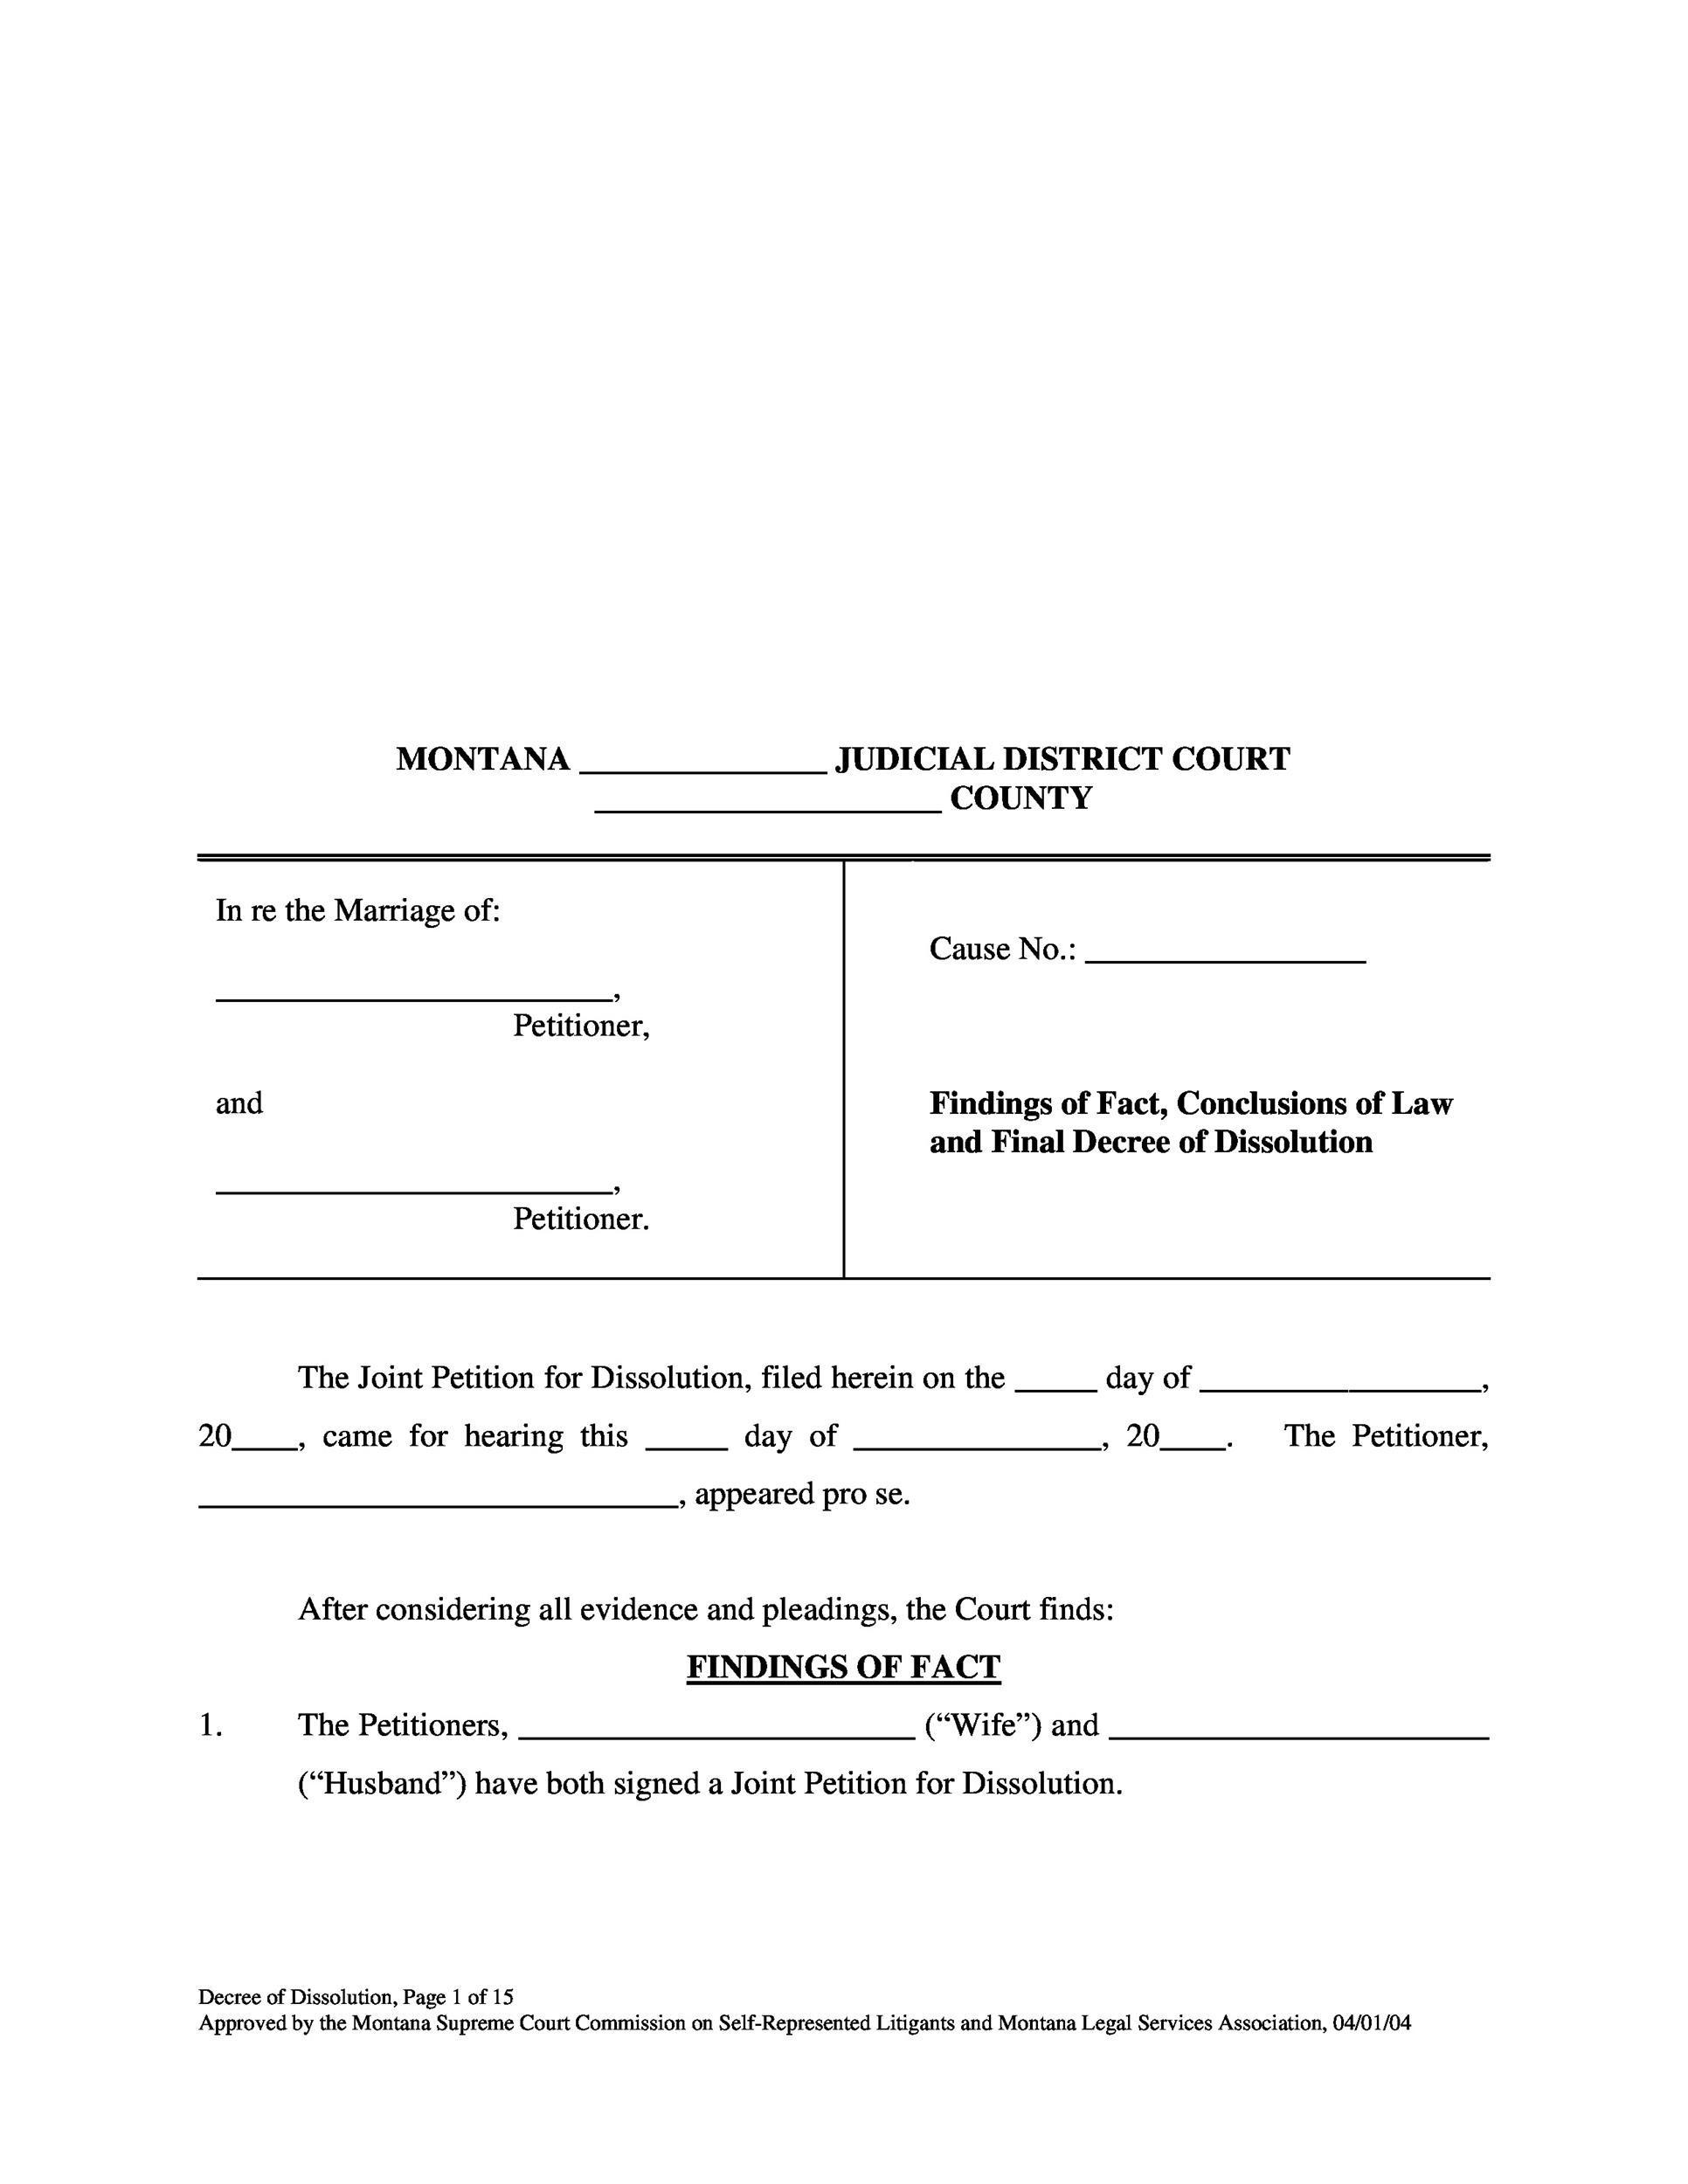 Divorce Decree Records: 40 Free Divorce Papers (Printable)